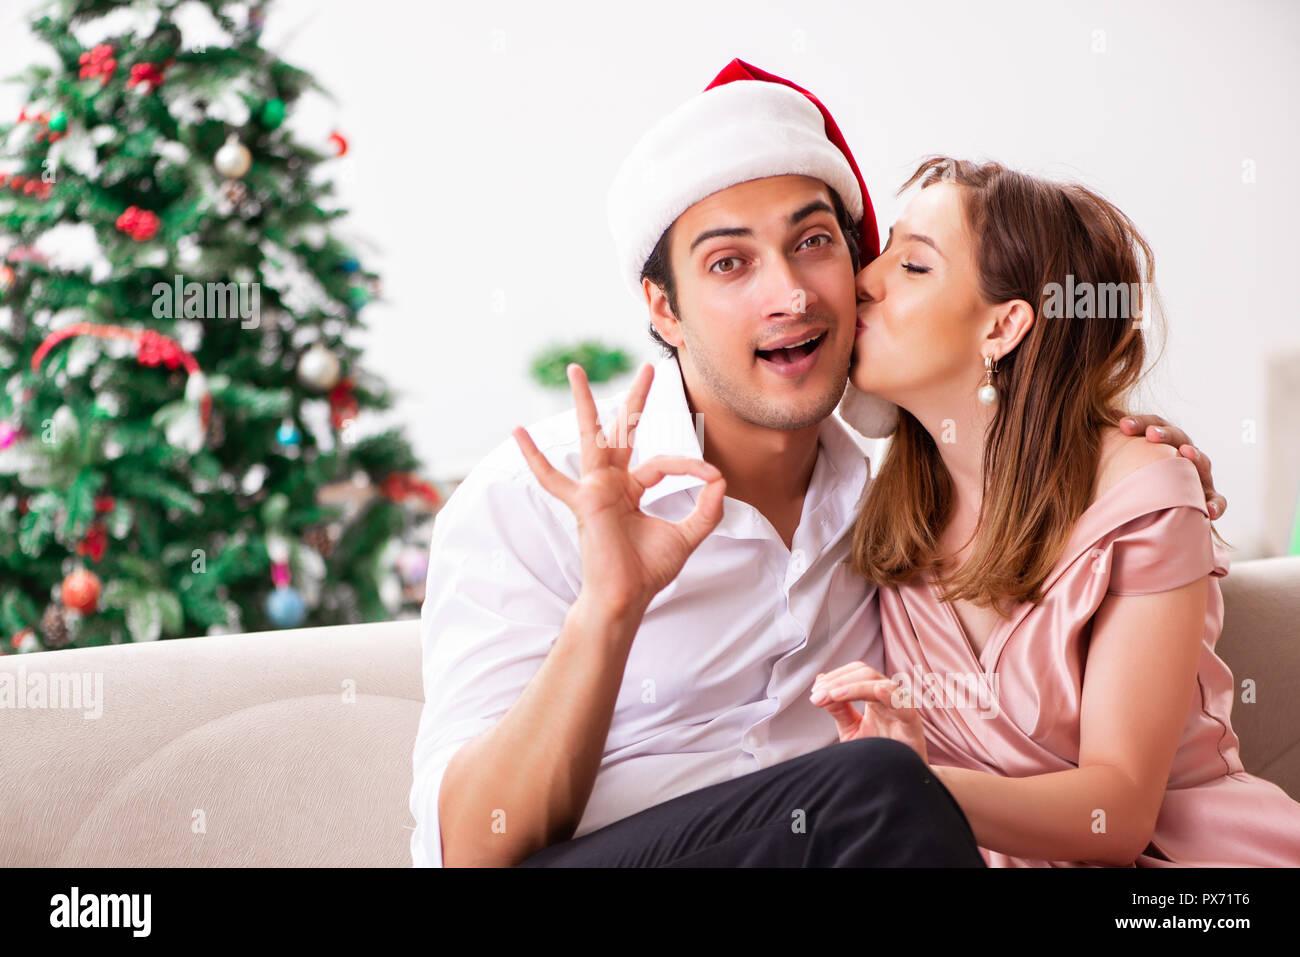 dating of christmas day